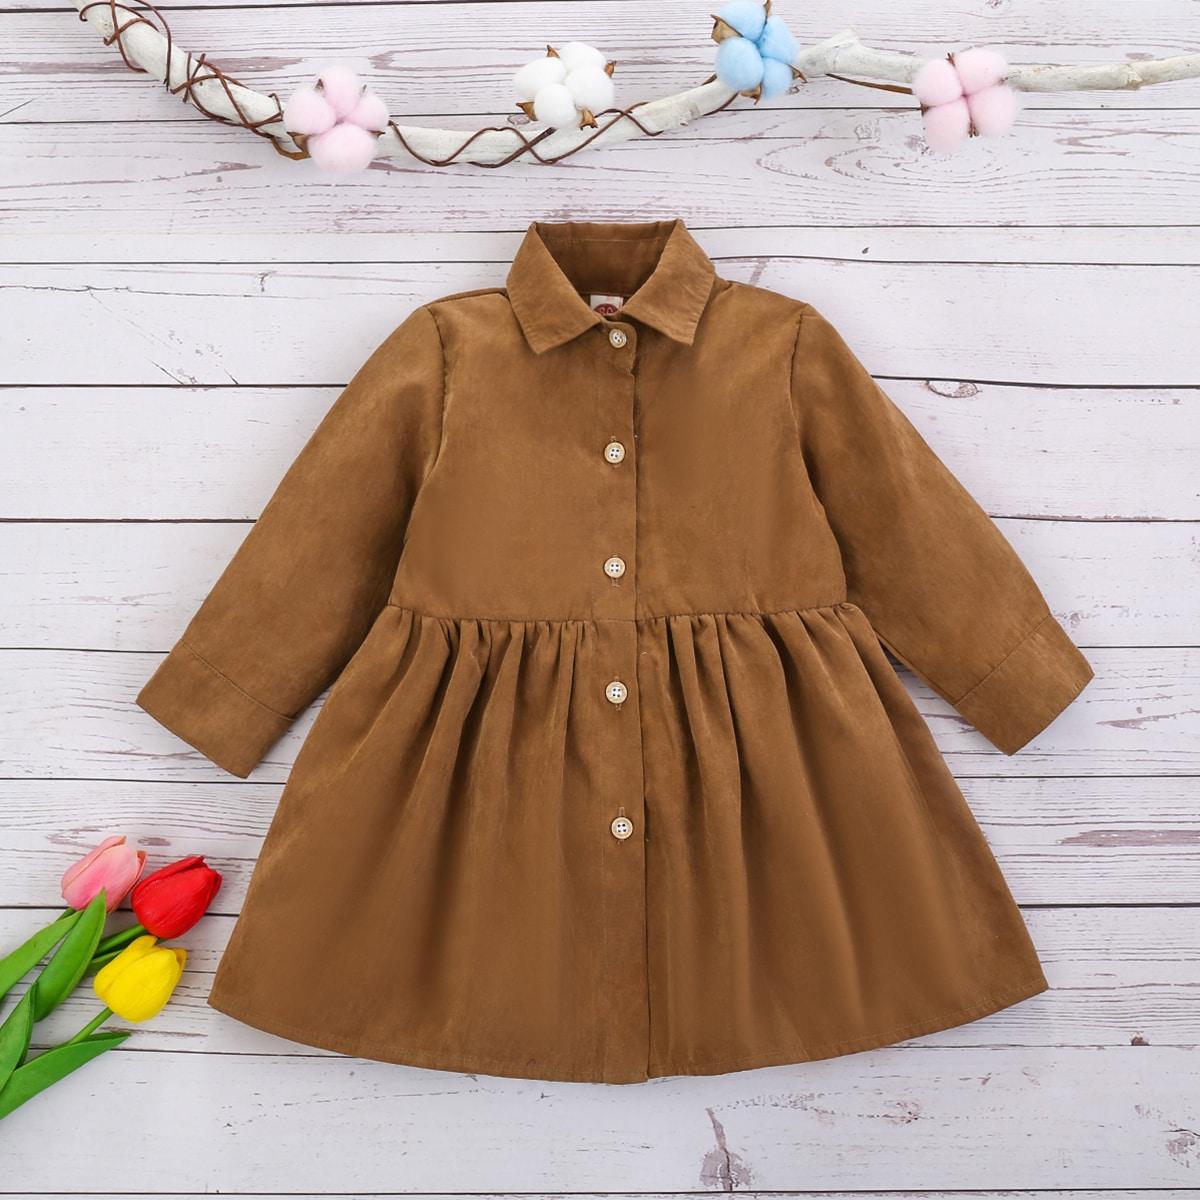 shein Casual Vlak Baby-jurk Voorpand met Knoopjes